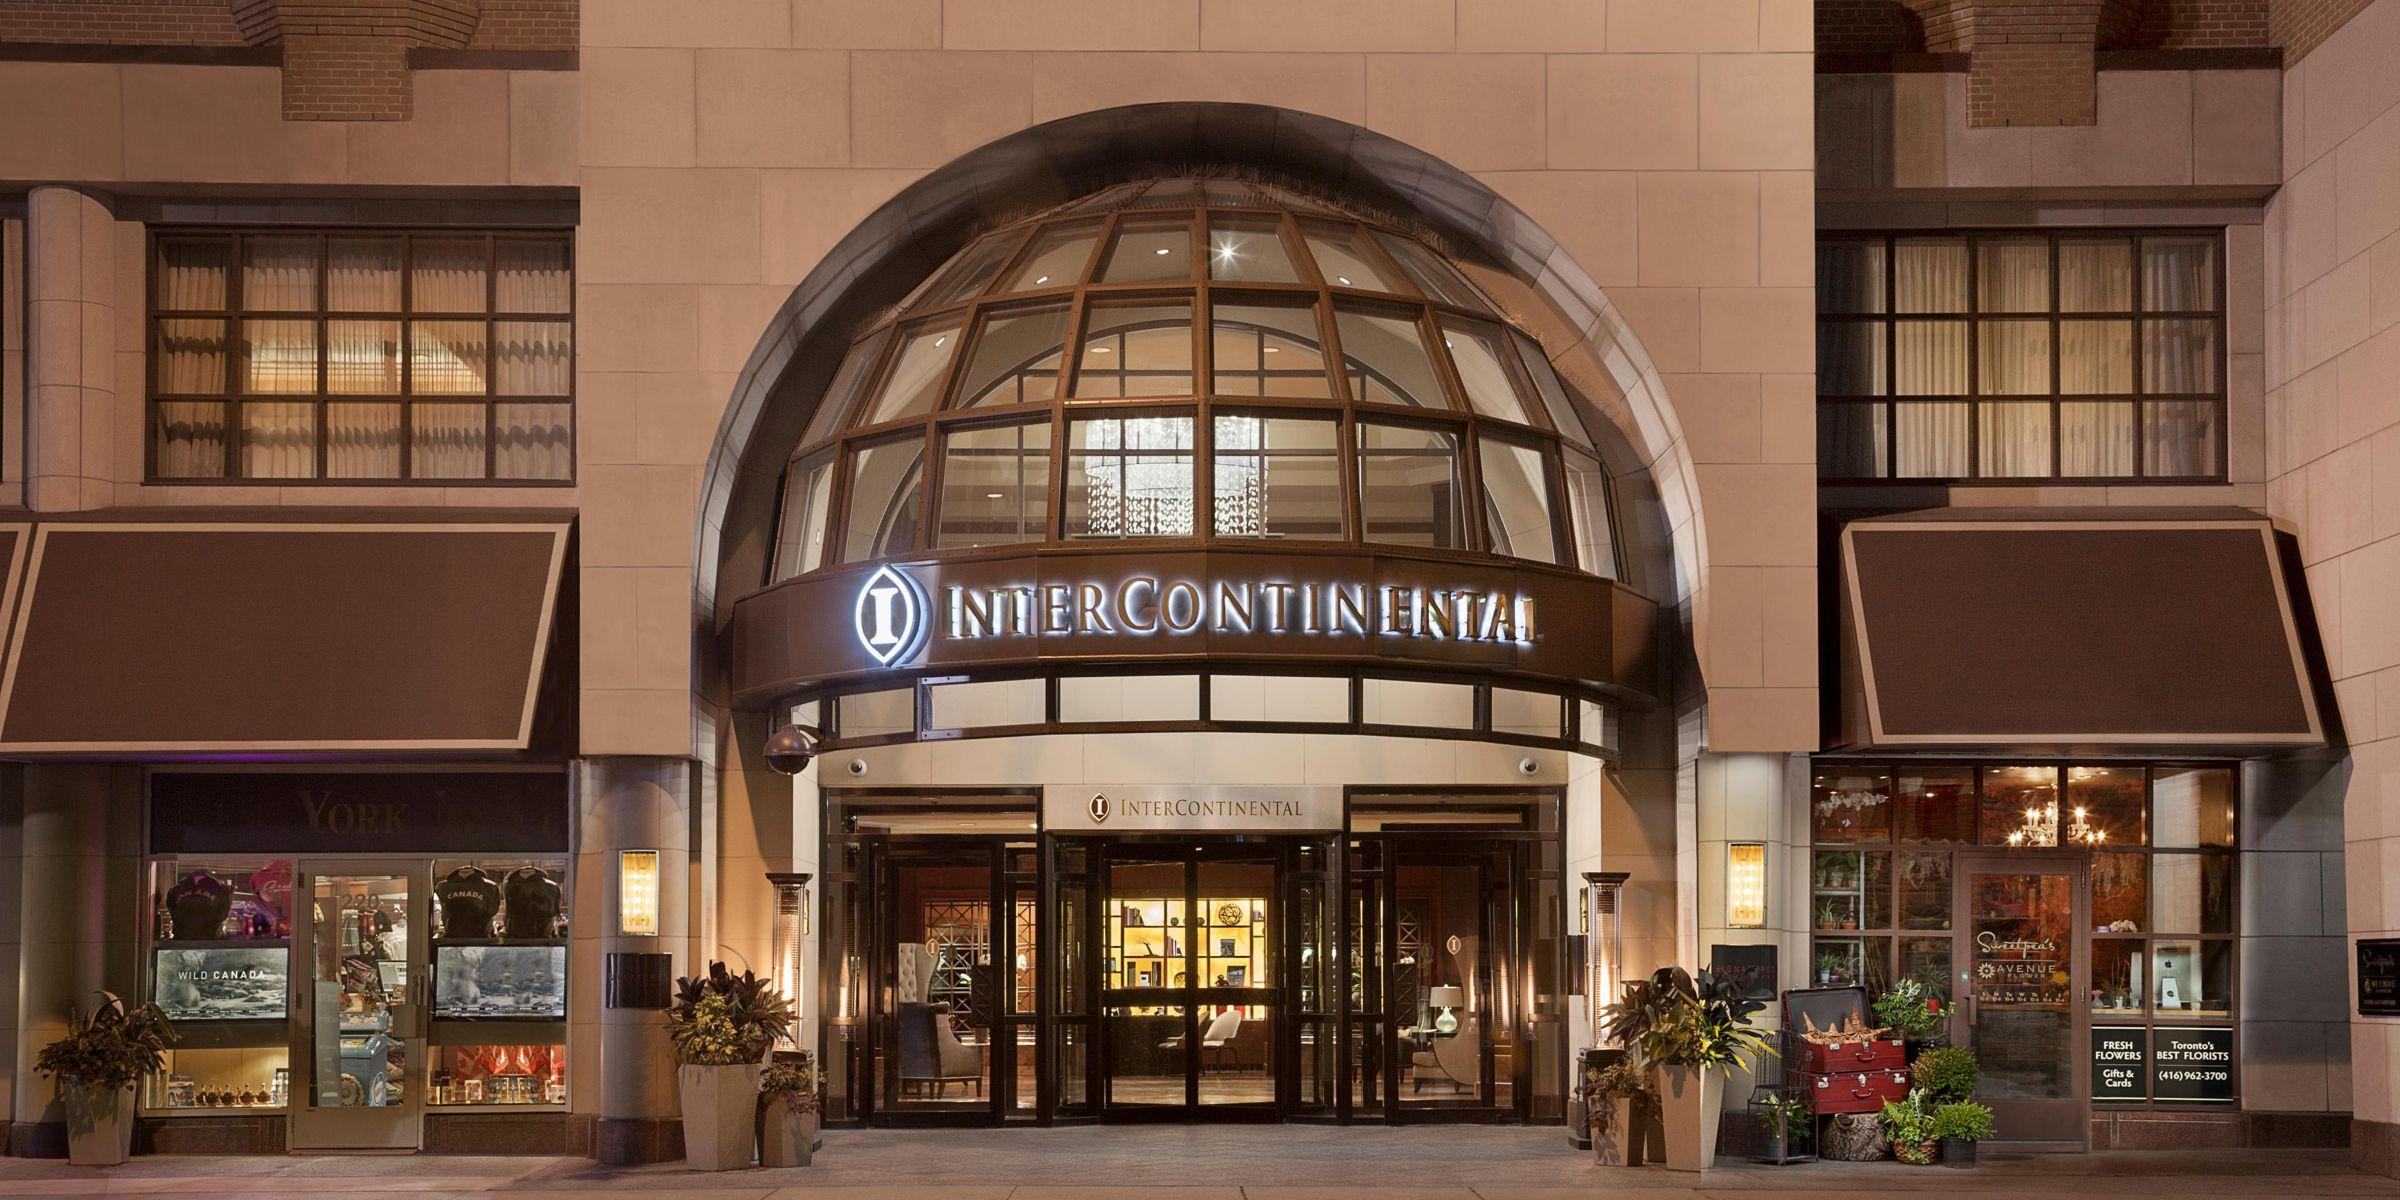 Concierge Desk InterContinental Toronto Yorkville Entrance Exterior Hotel